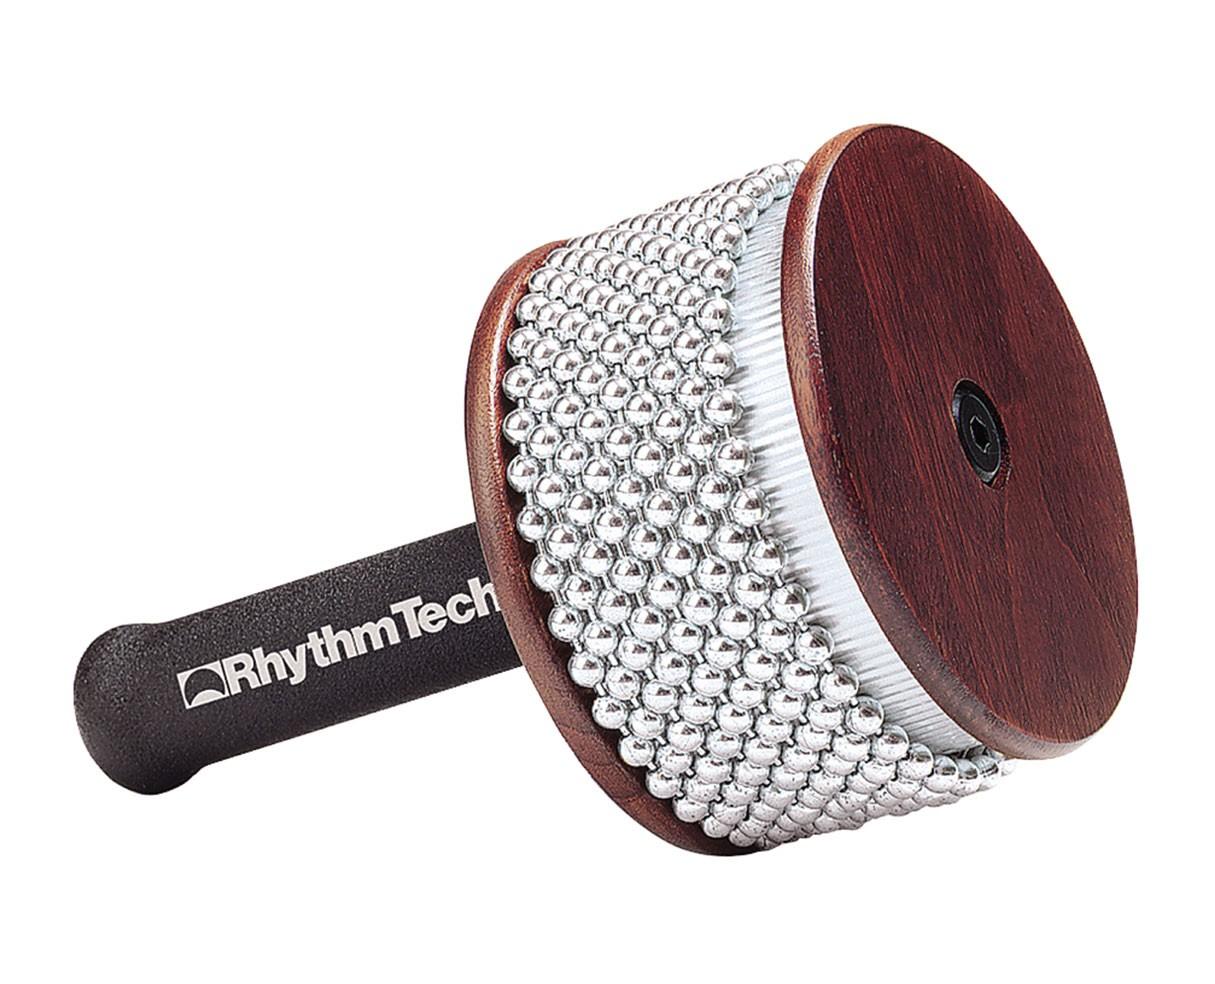 Rhythm Tech RT8000 Cabasa